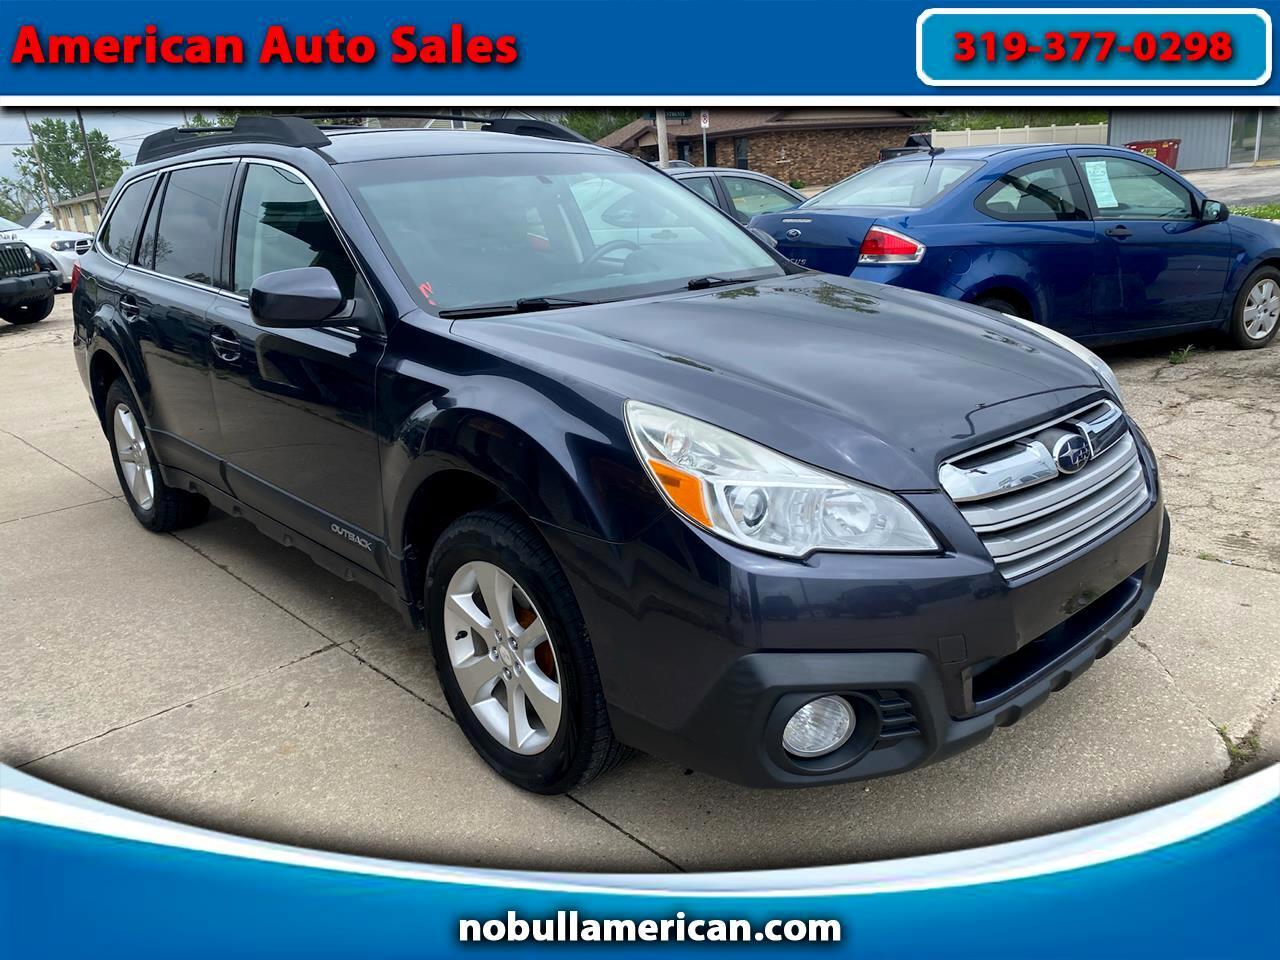 Subaru Outback 2.5 XT 2013